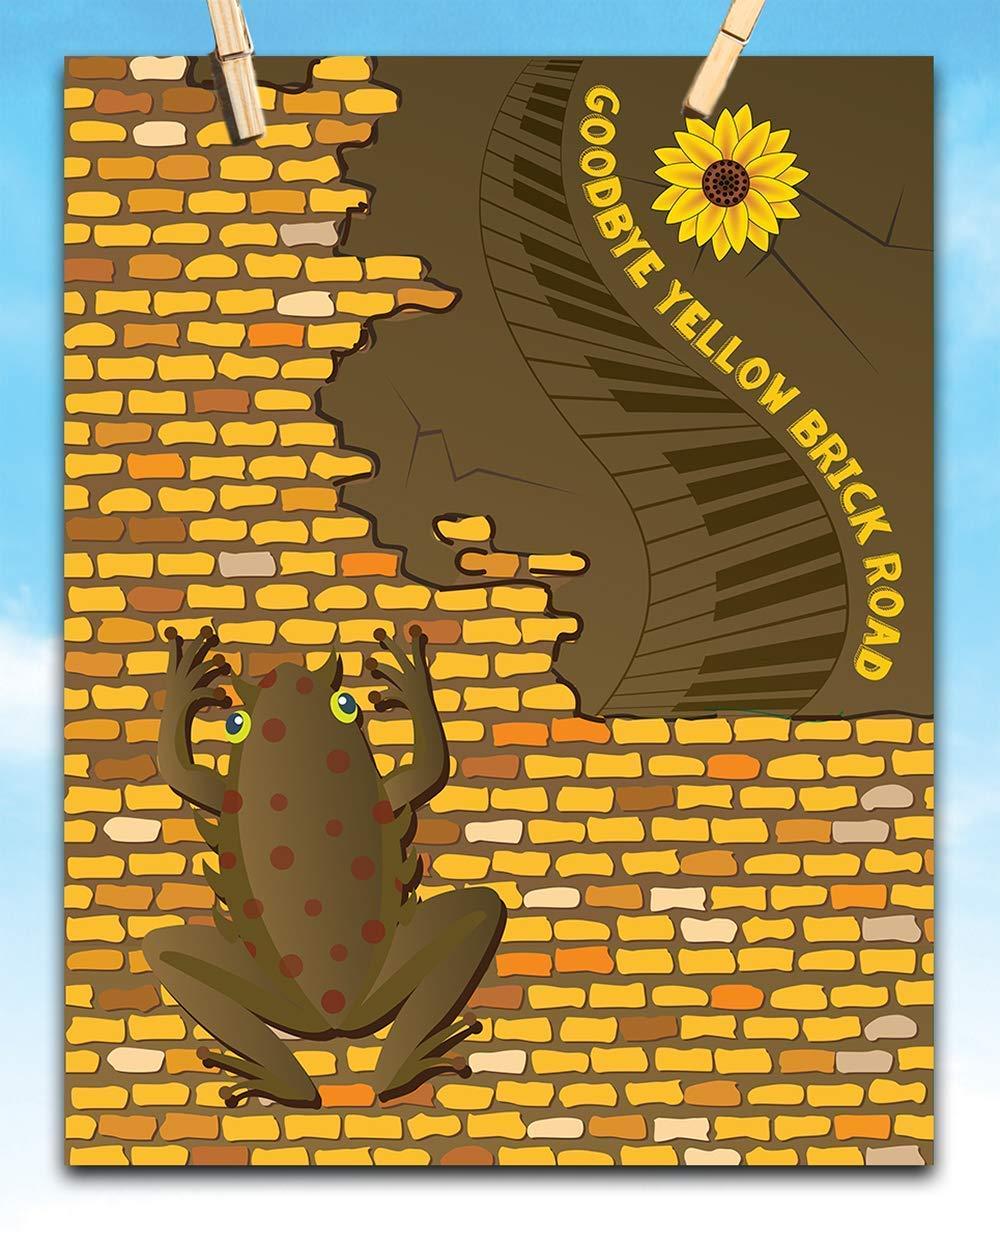 goodbye yellow brick road lyrics